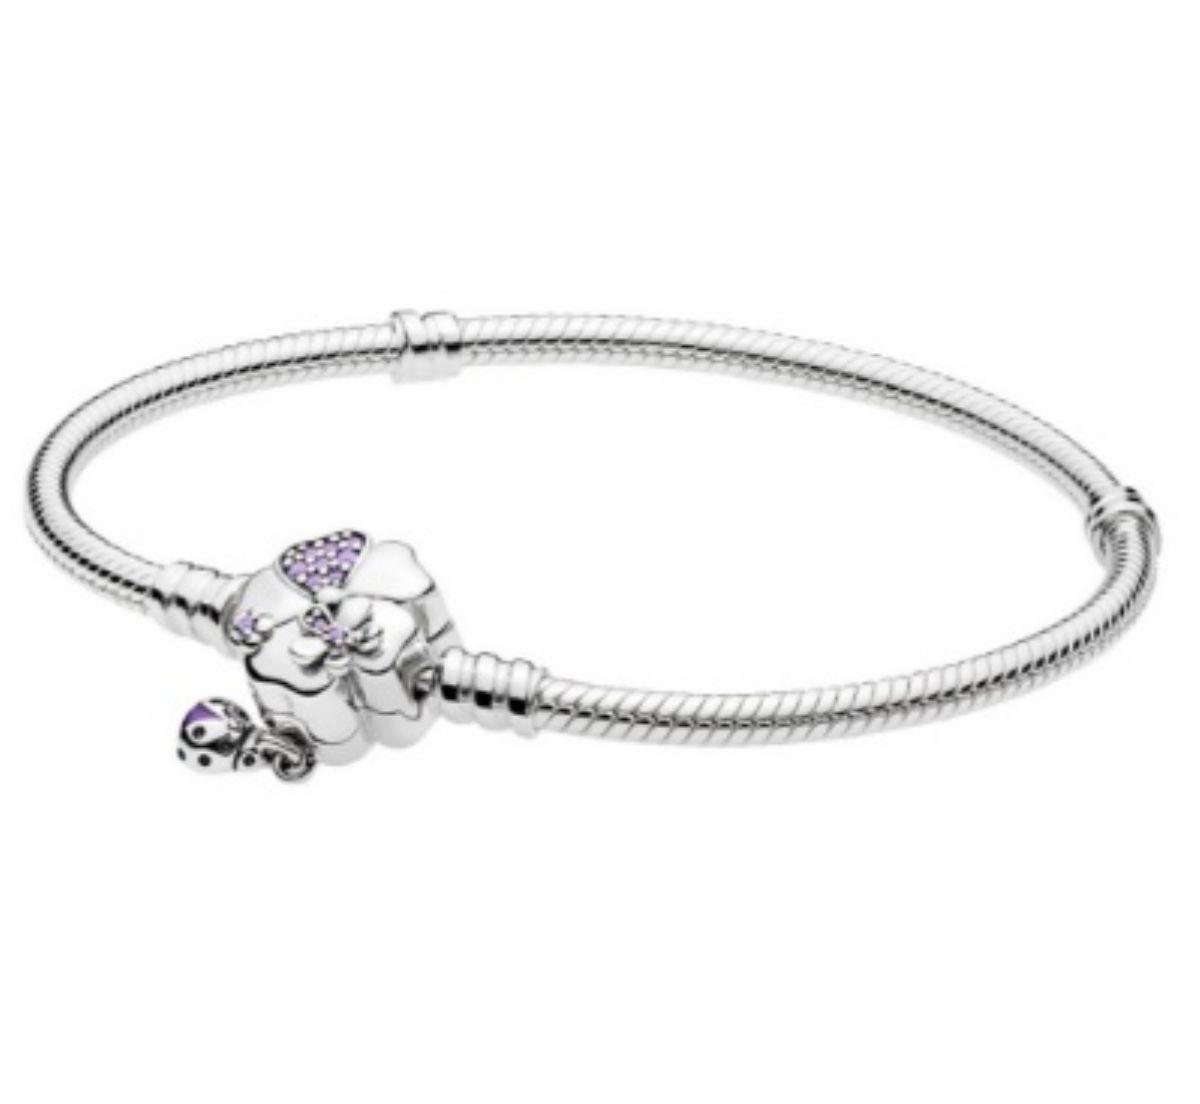 ... Stříbrný náramek Pandora - Klasik květnatá louka 1 3 ... 6bbd8ac07f8